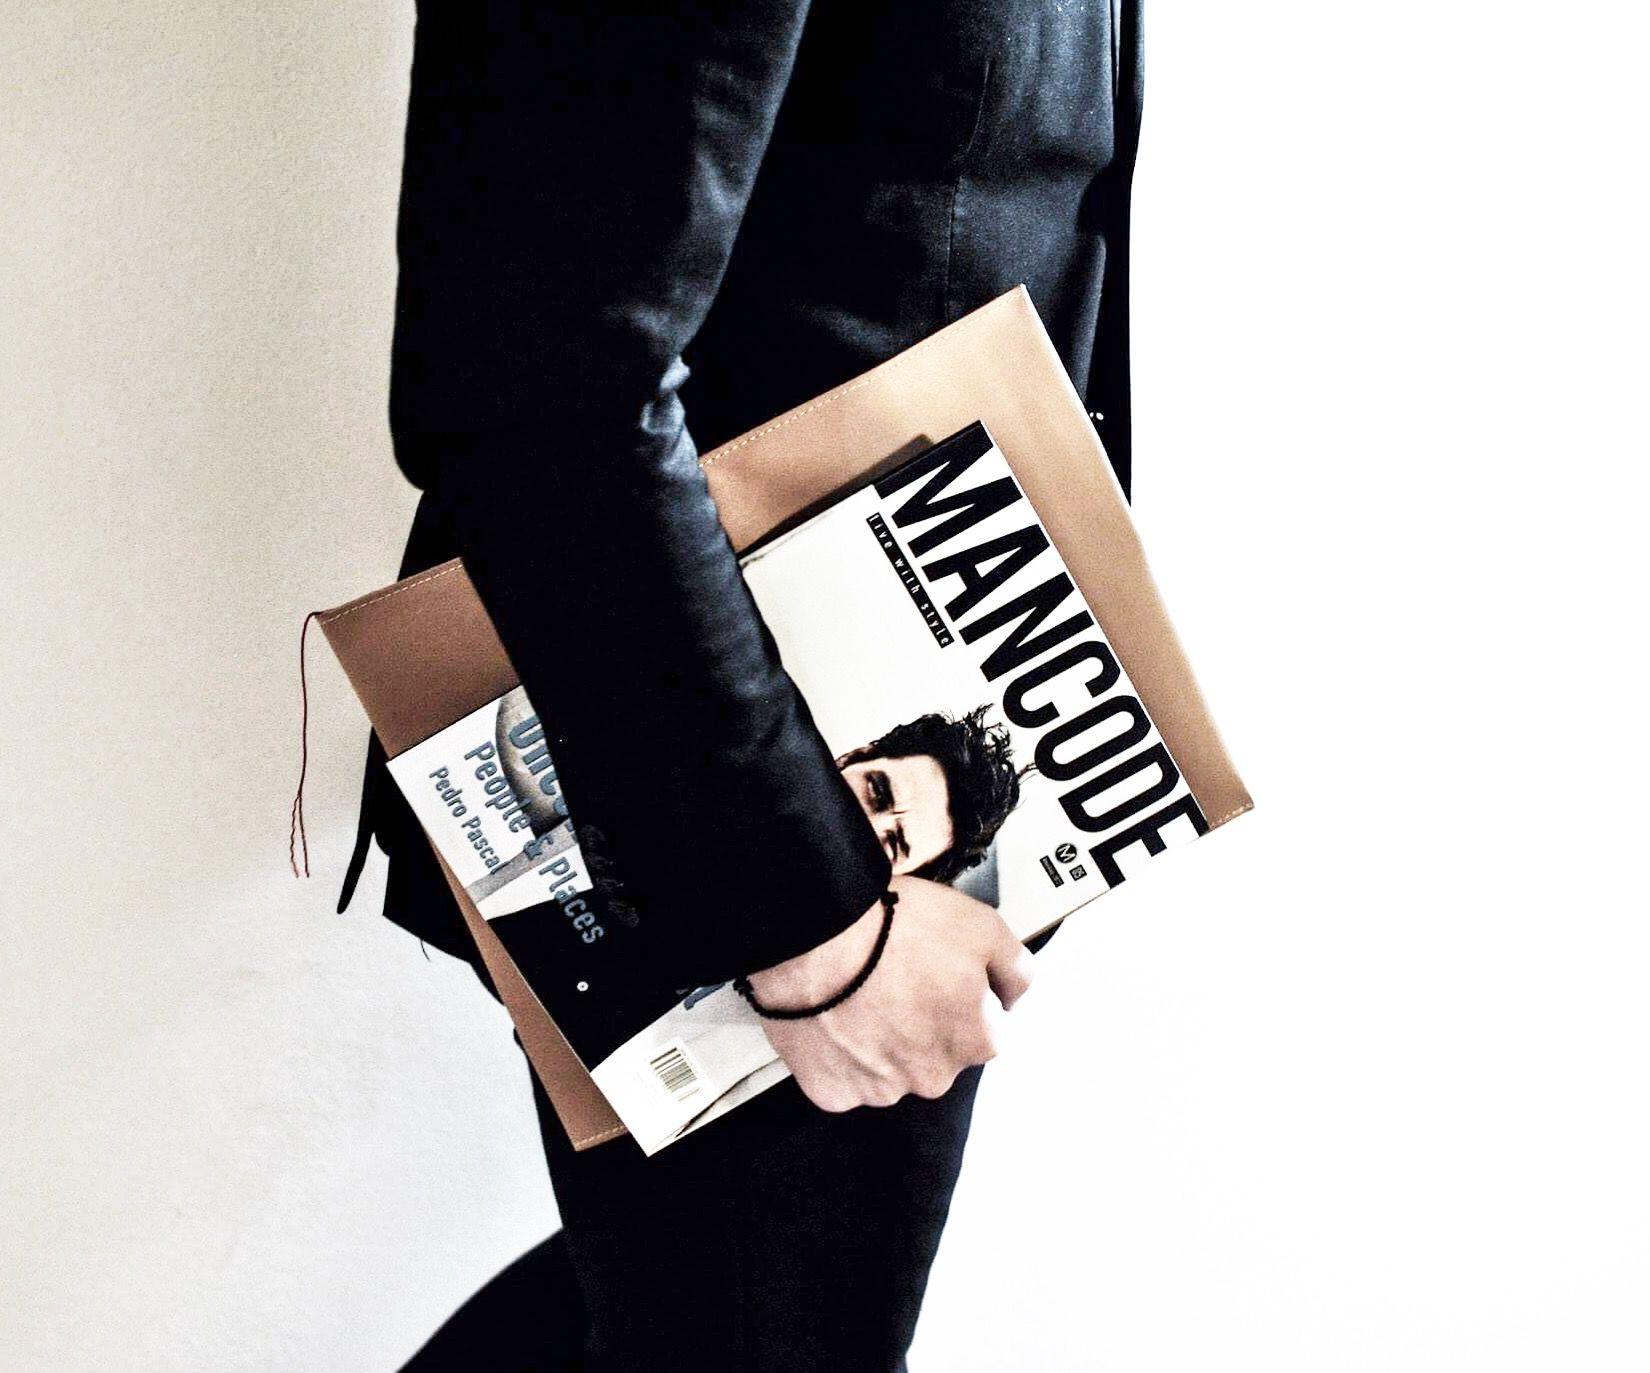 Lifestyle Mancode Black Serious Magazine Fashion Men Menstyle